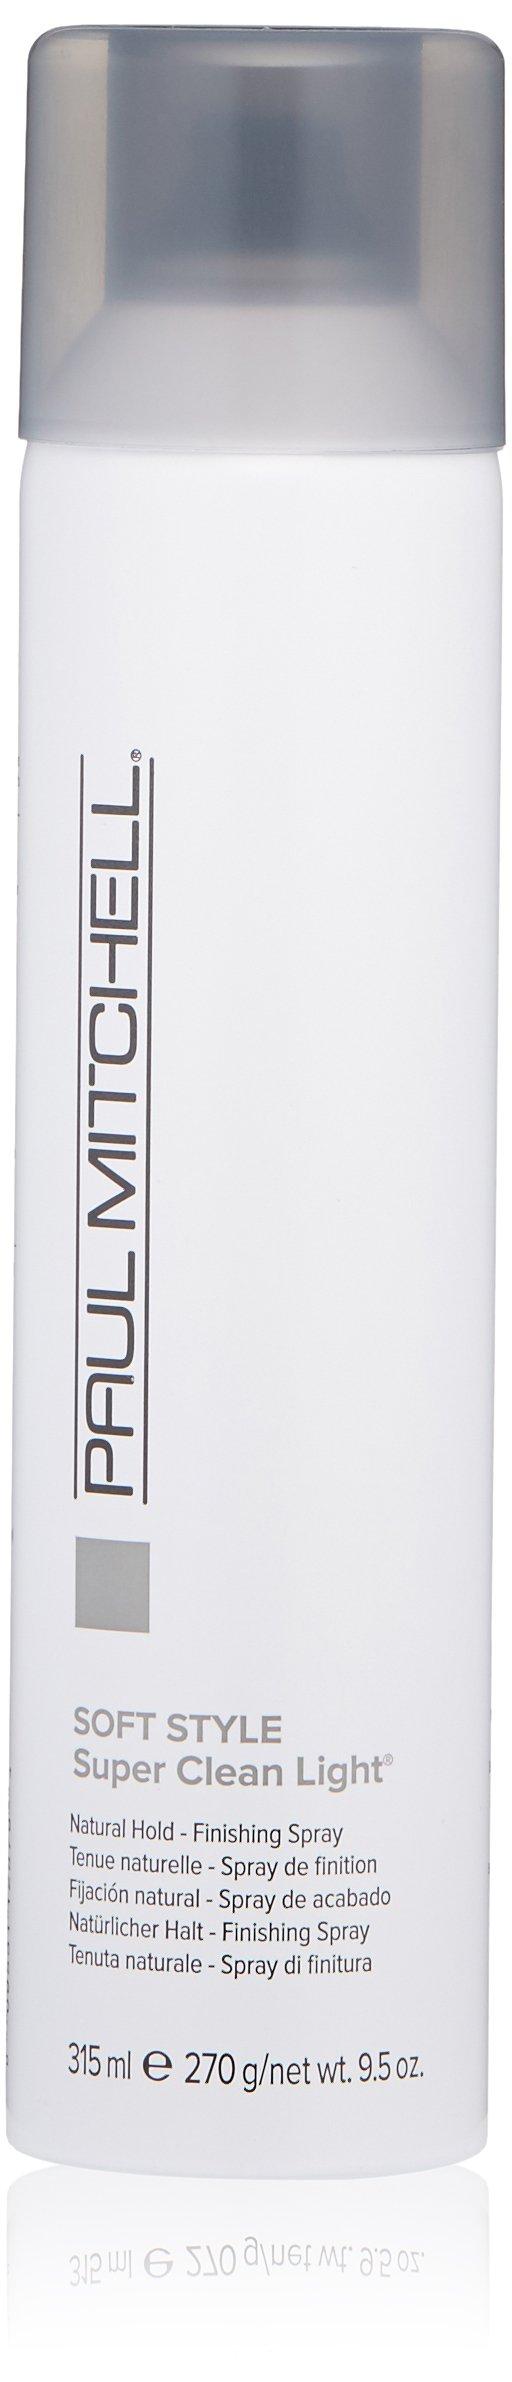 Paul Mitchell Super Clean Light Hairpray,9.5 oz by Paul Mitchell